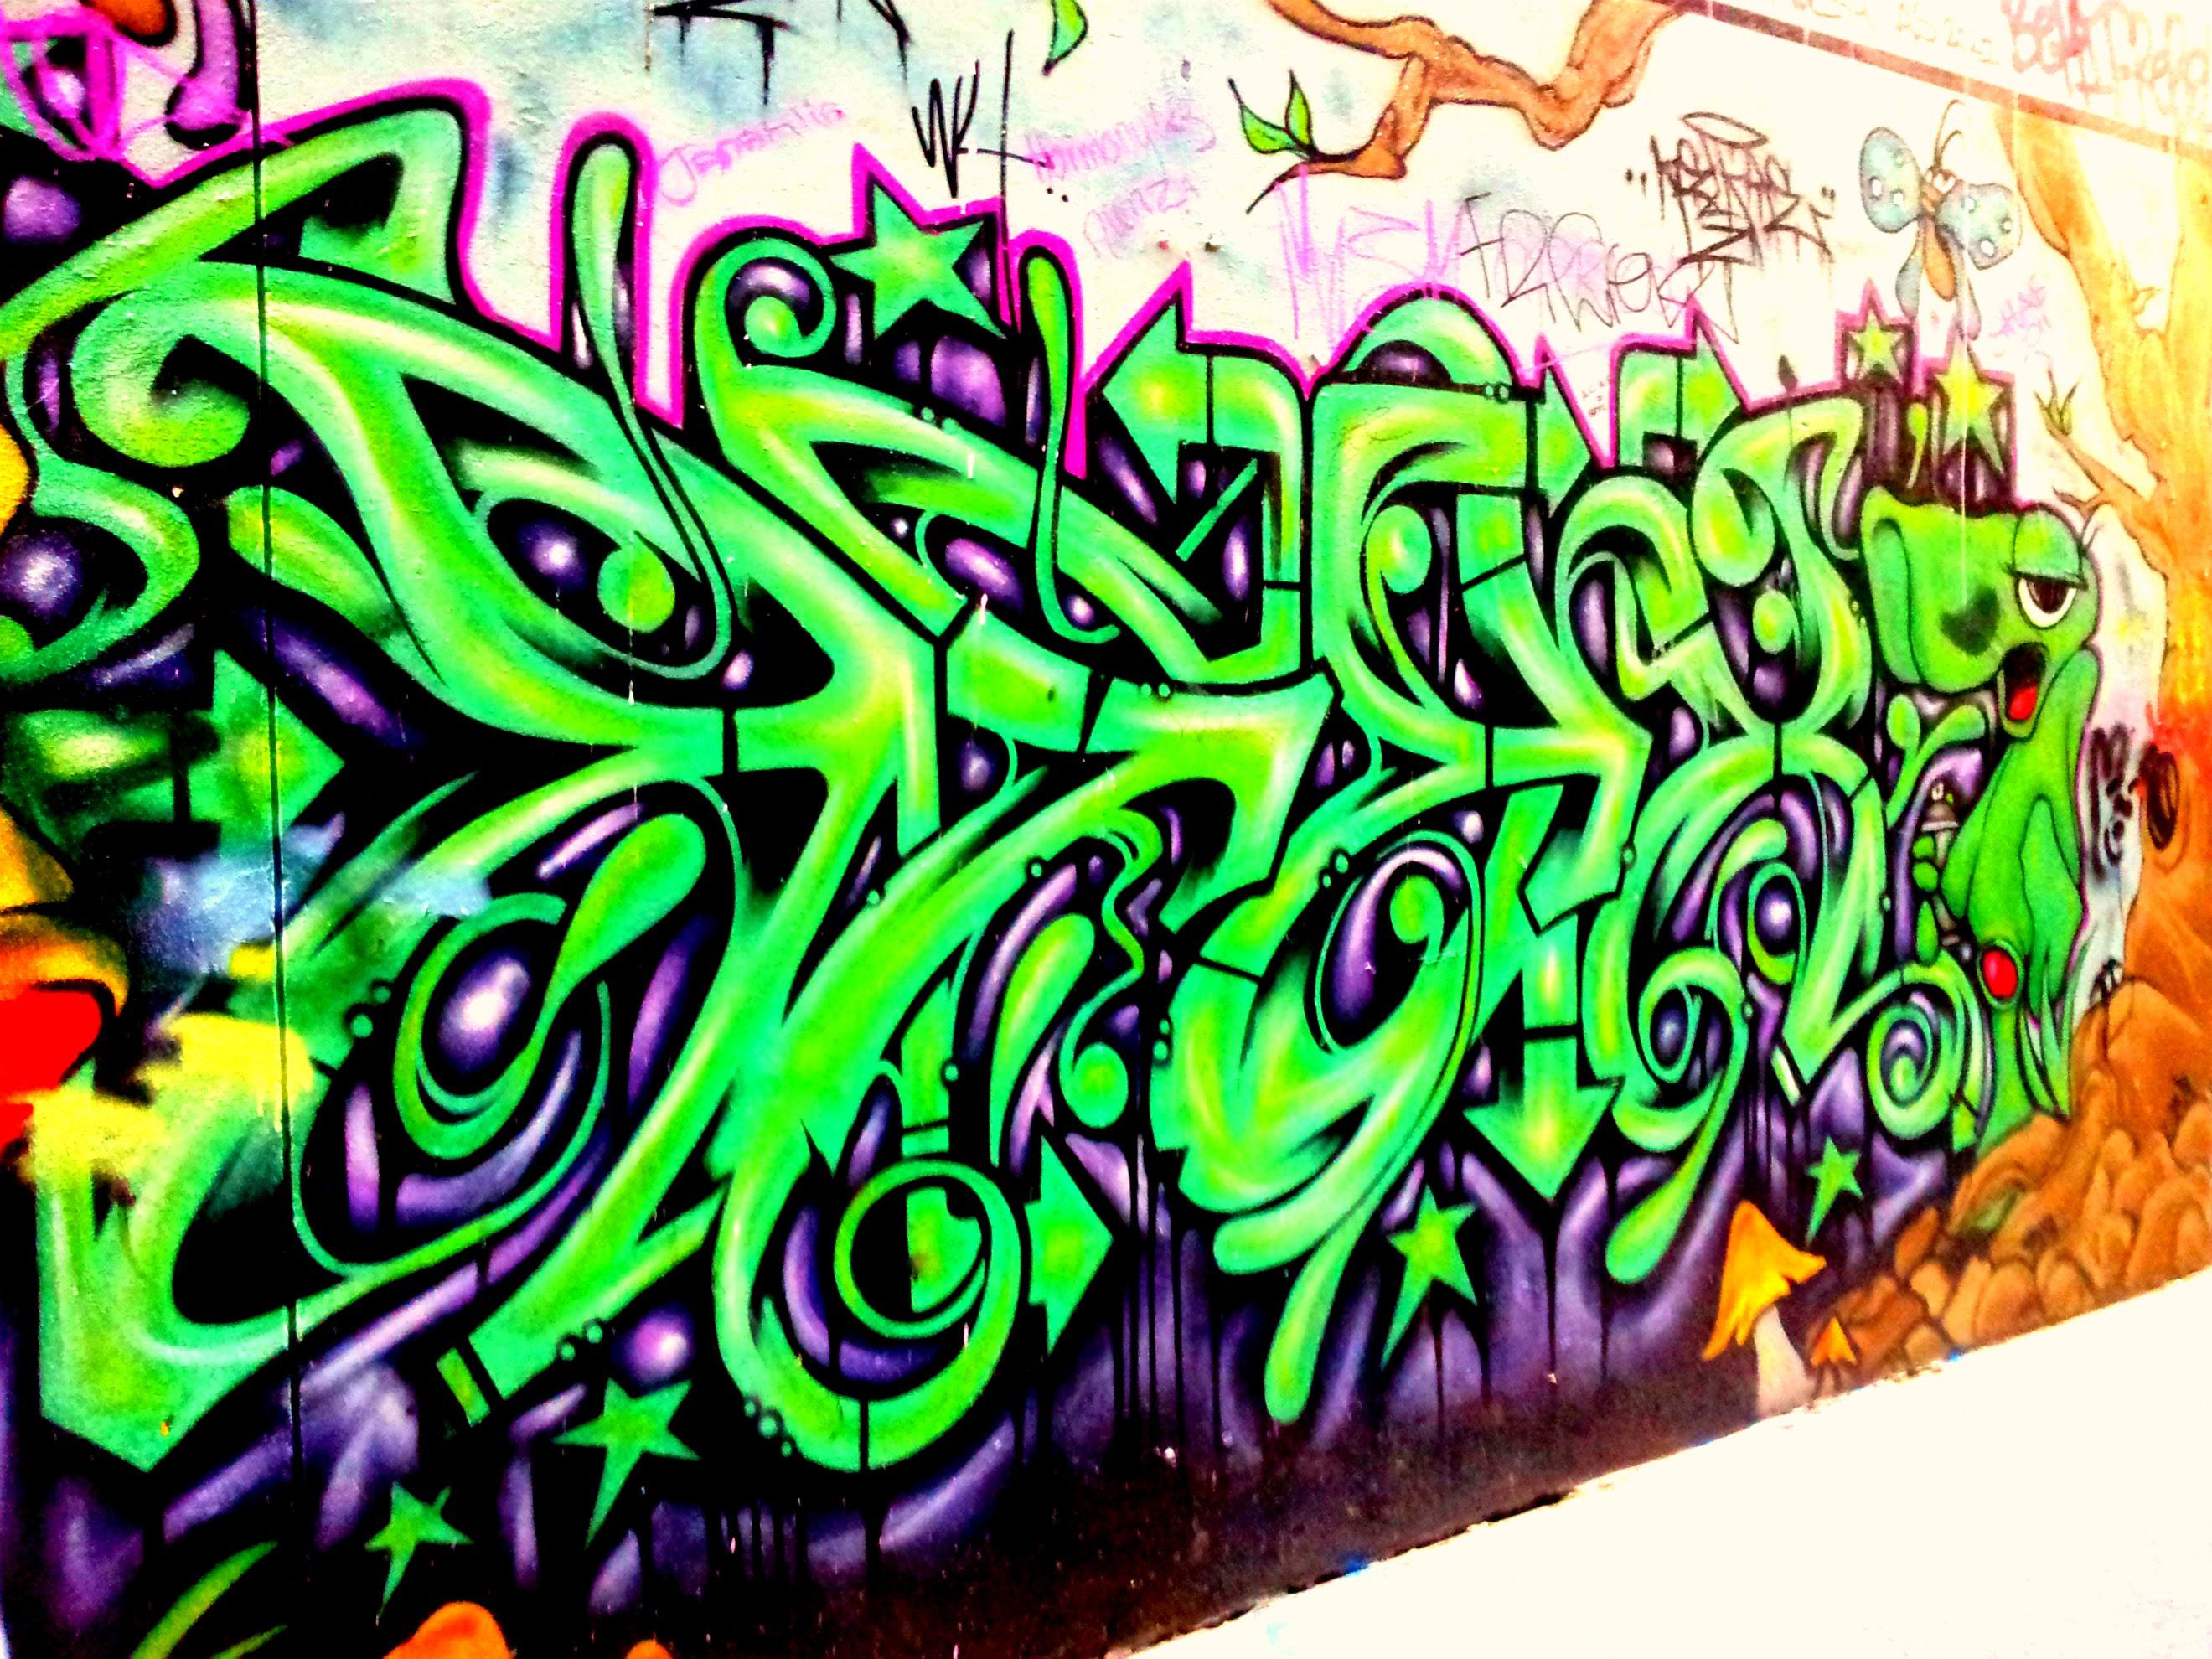 daftar graffiti kings wallpaper  wallpaper apel